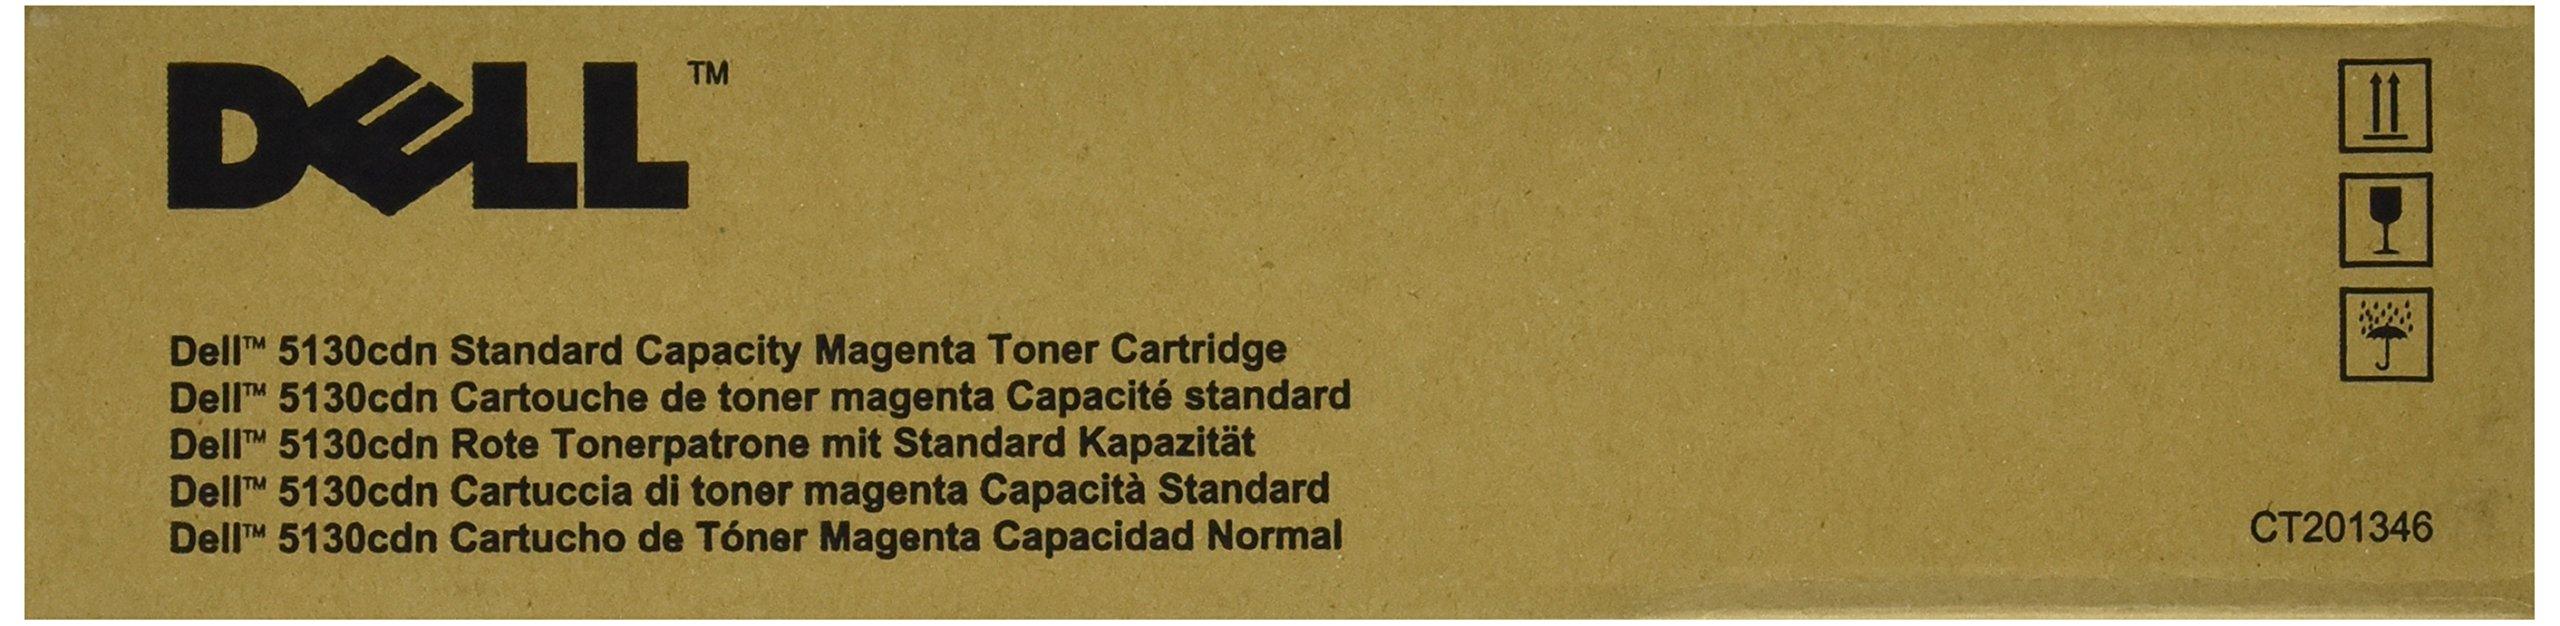 Toner Original DELL P615N Magenta 5130cdn Color Laser